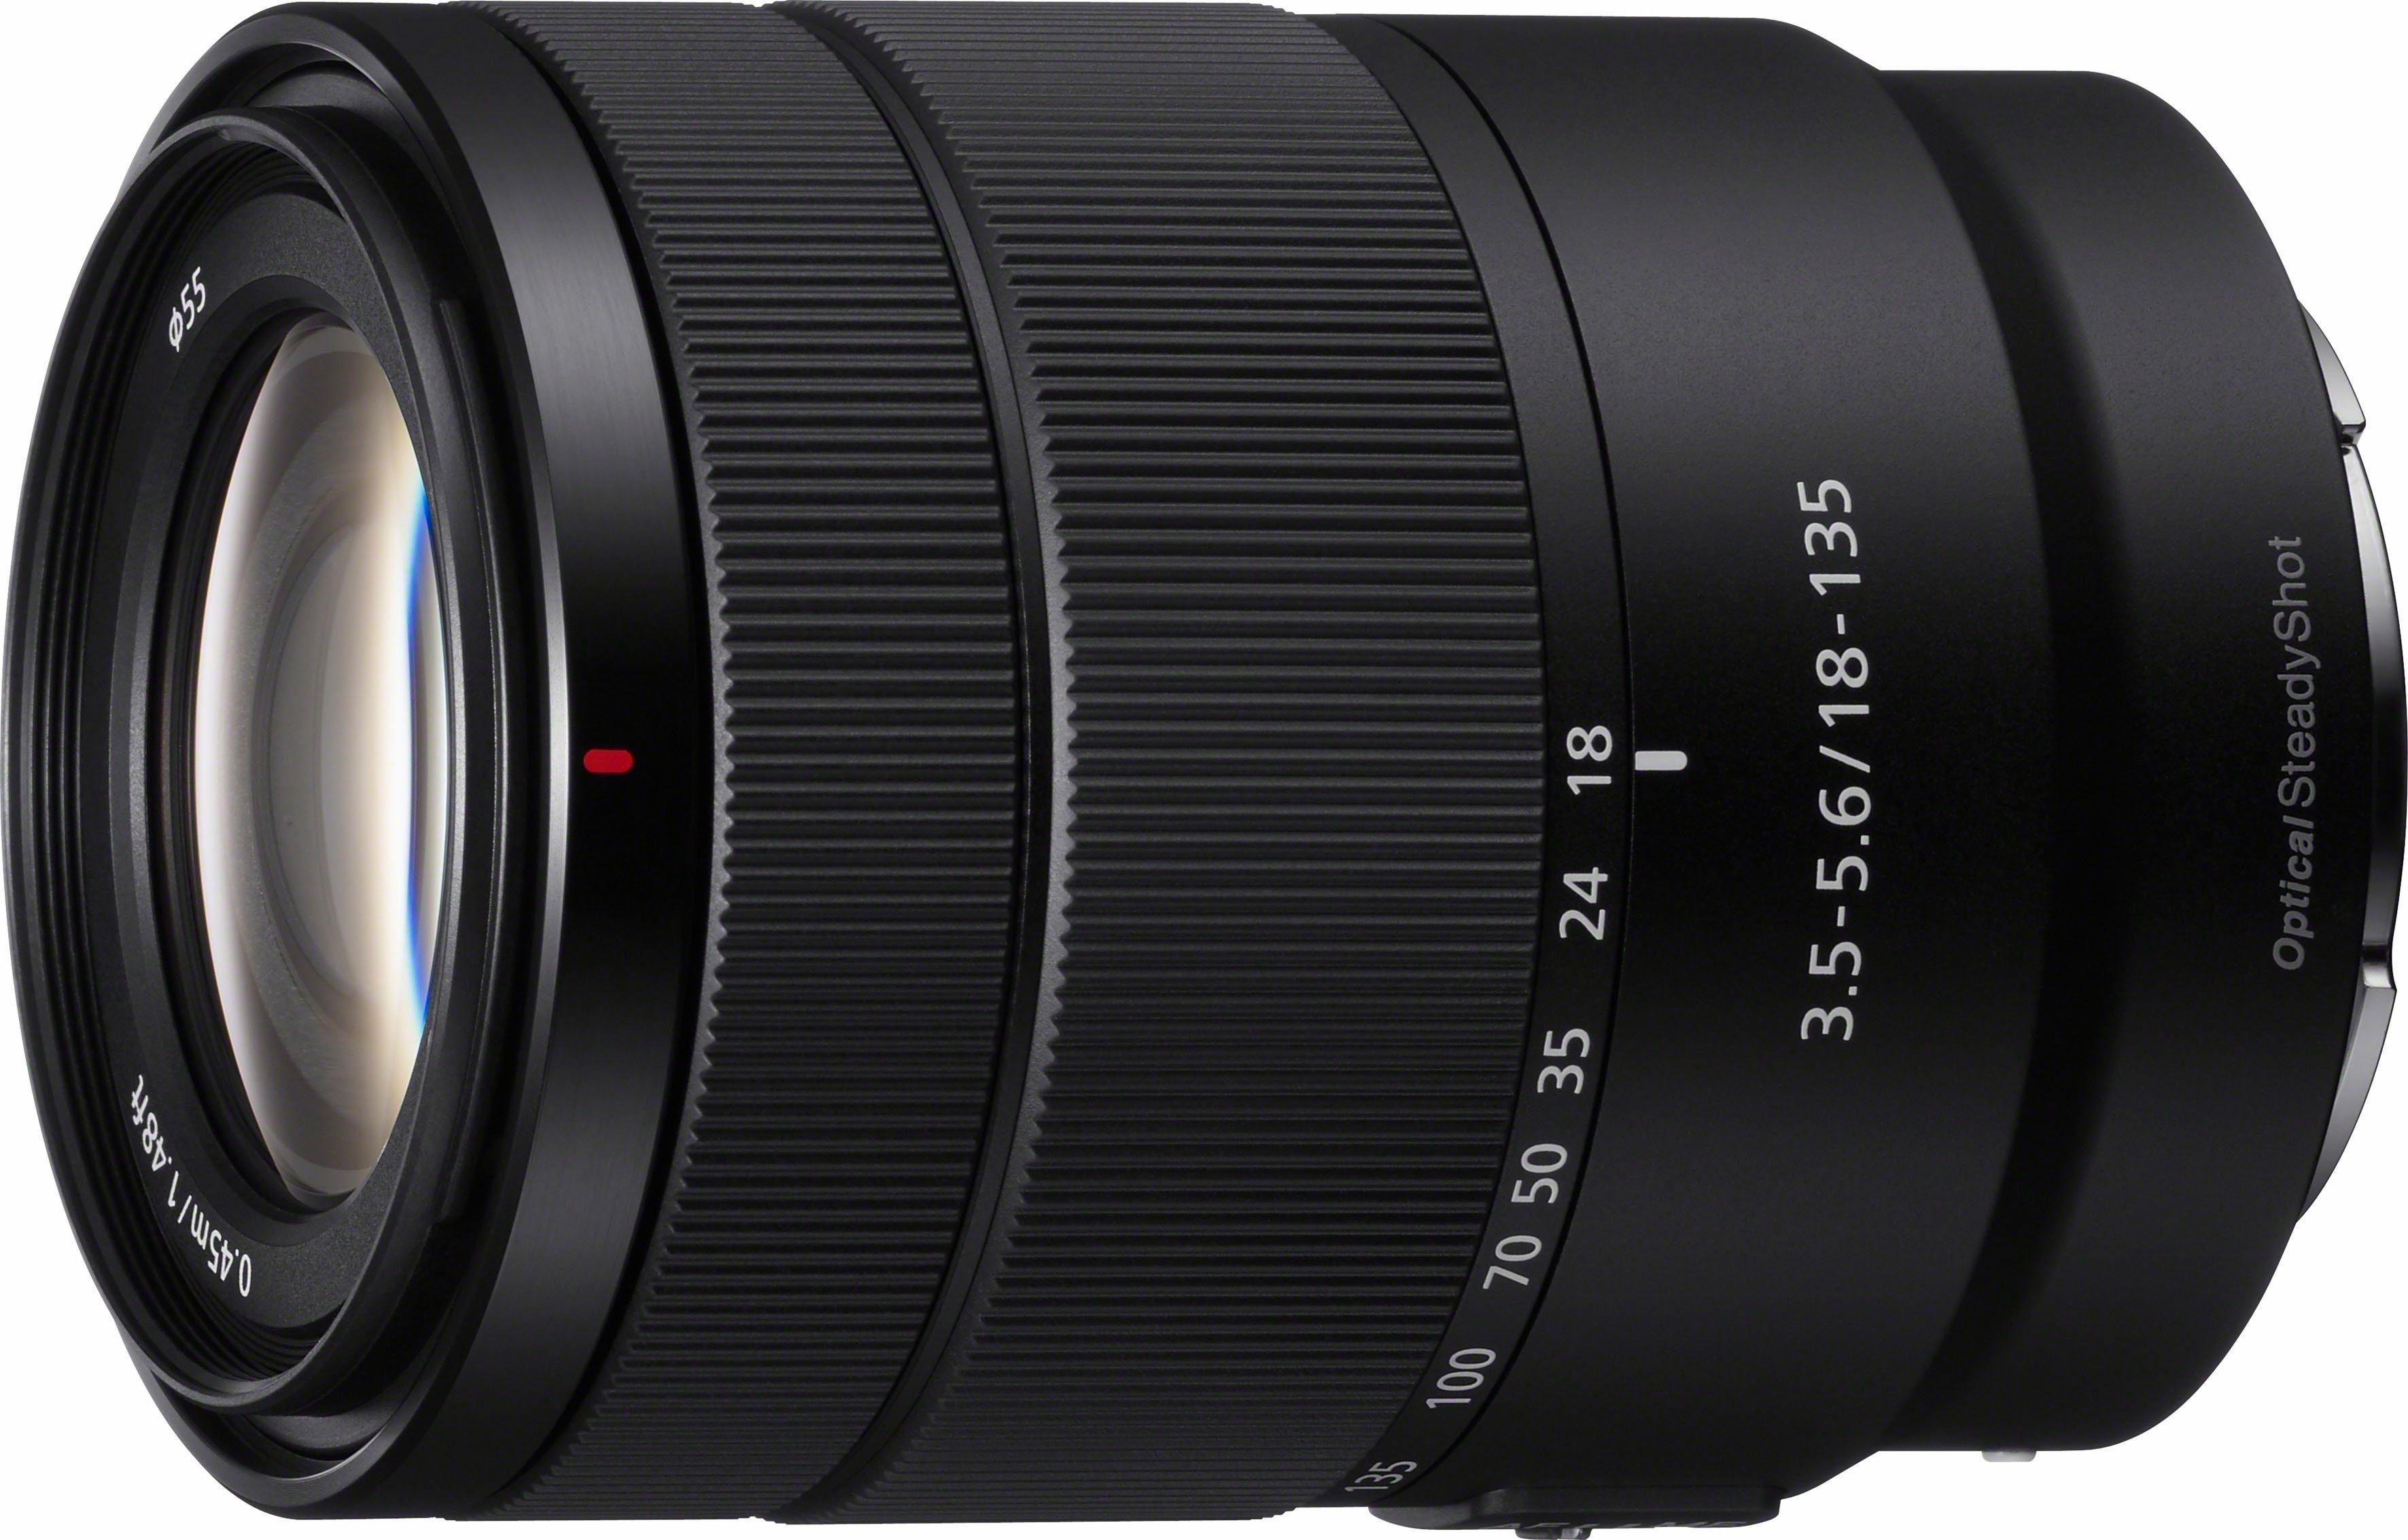 Sony SEL-18135 Zoom Objektiv 18-135mm F3.5-5.6 OSS (E-Mount APS-C für A5000/A5100/A6000 Serien & Nex)